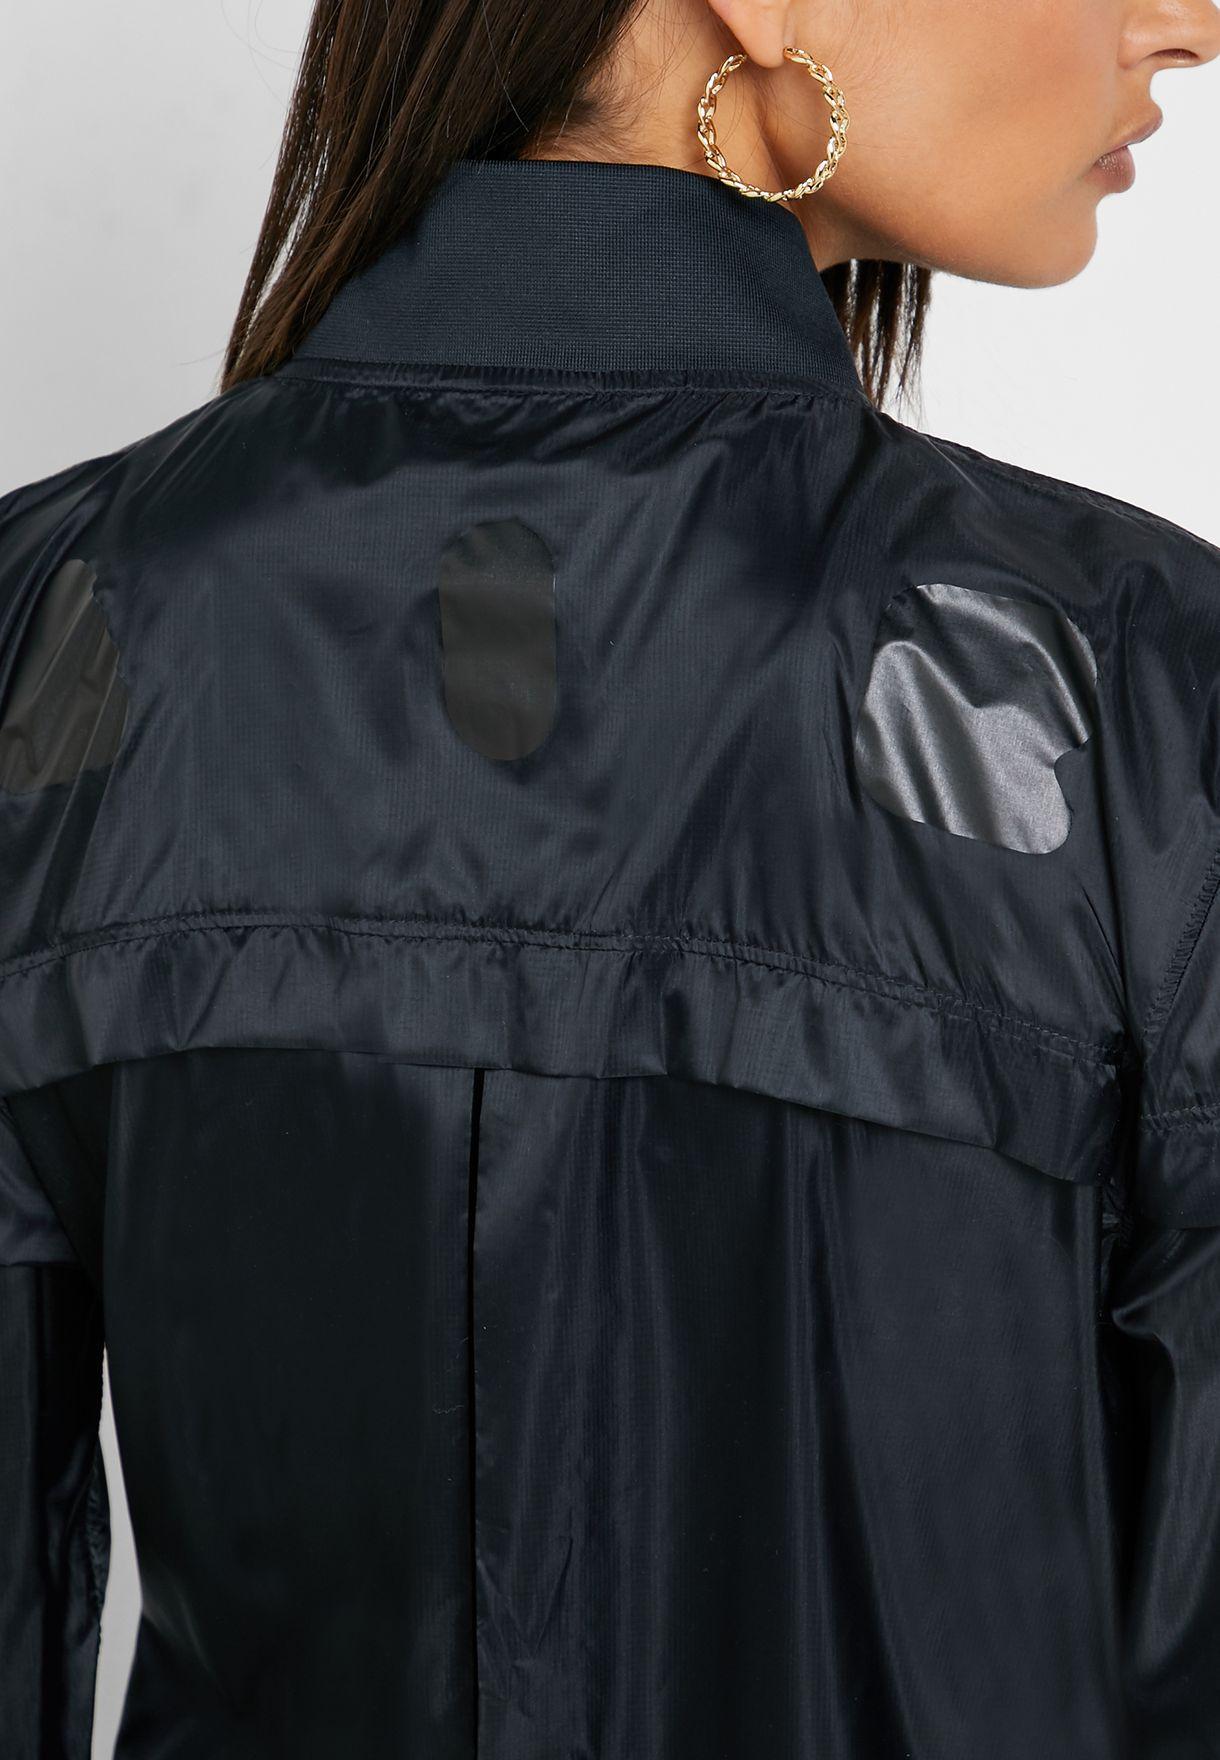 Buy Nike Black Nsw Futura Air Jumpsuit For Women, Uae 72704at92pbp